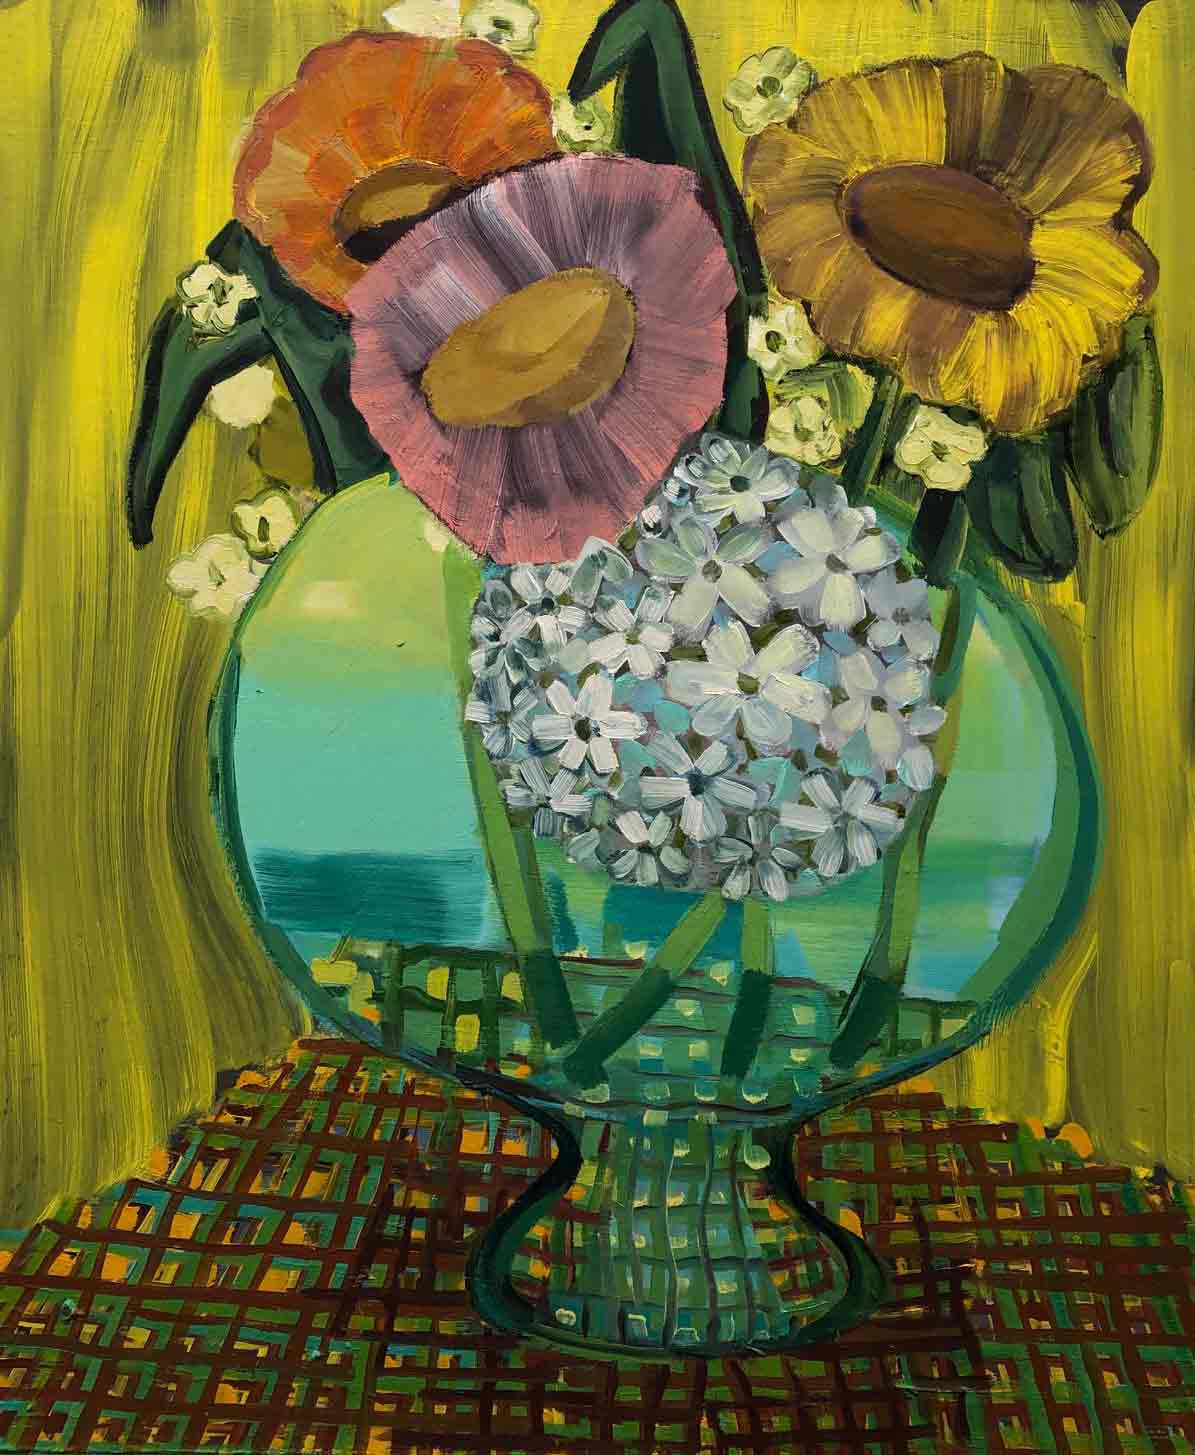 Judith-Linares-flowers-2.jpg